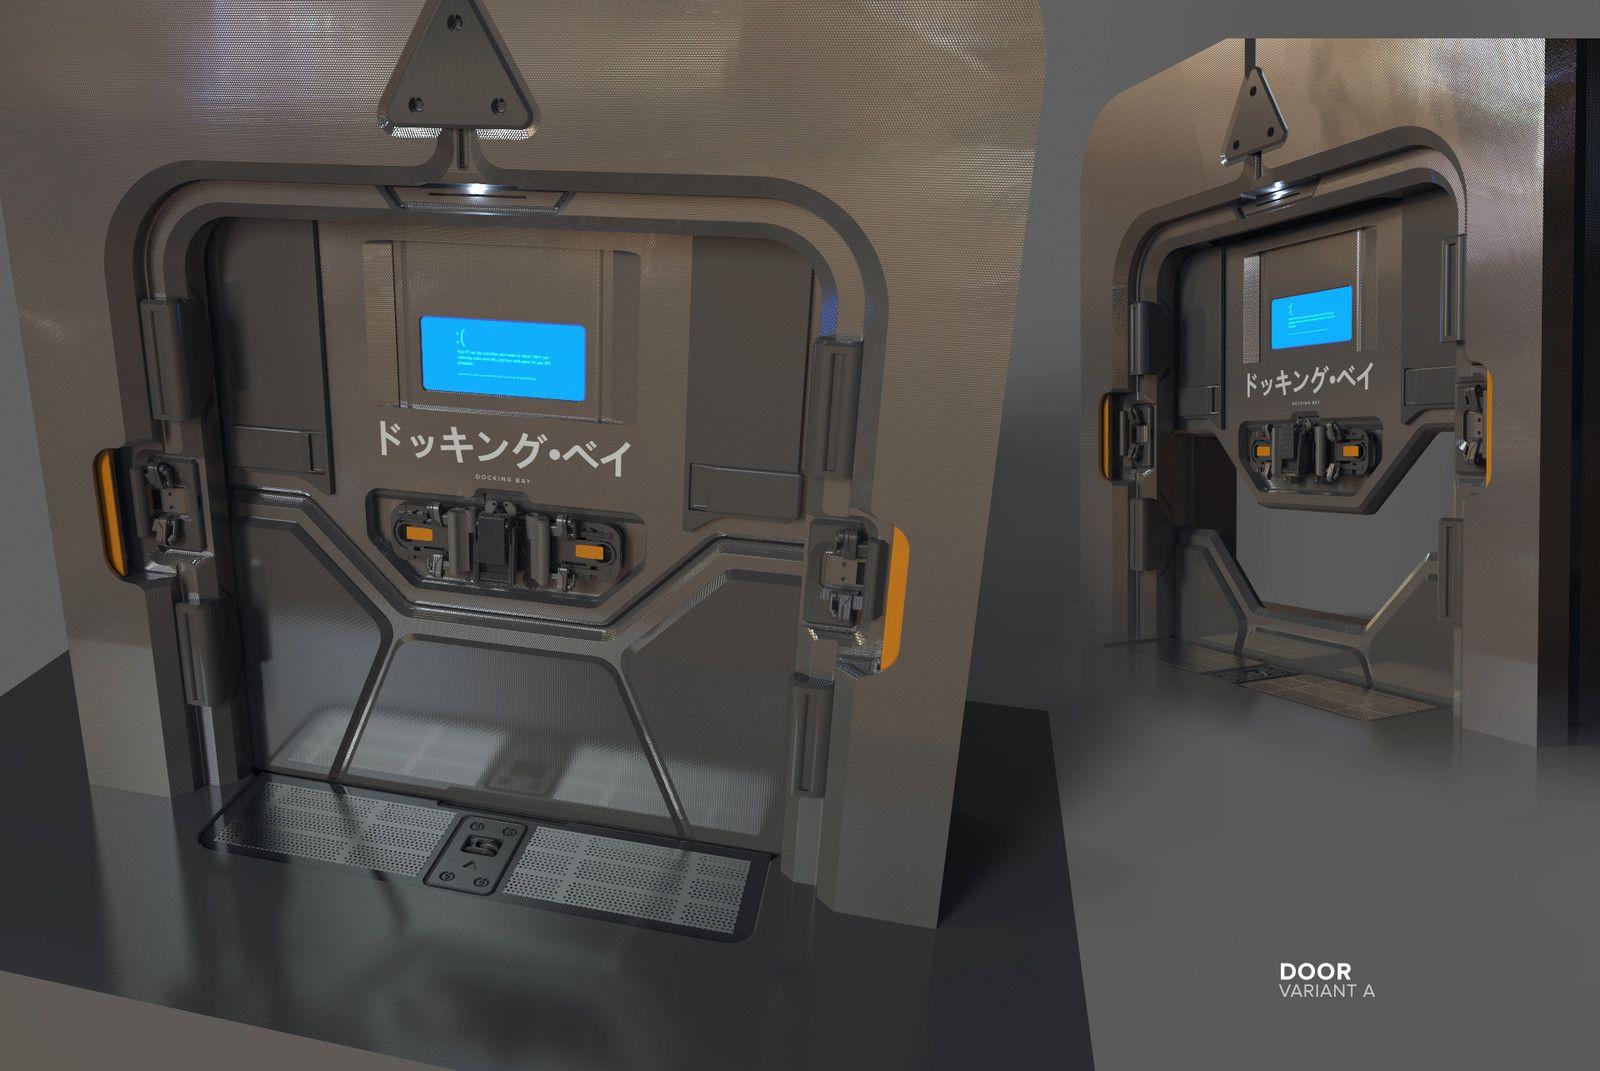 Door Concept For Lawbreakers Oberfett Kirill Chepizhko On Artstation At Https Www Artstation Com Artwork A2165 With Images Spaceship Interior Sci Fi Environment